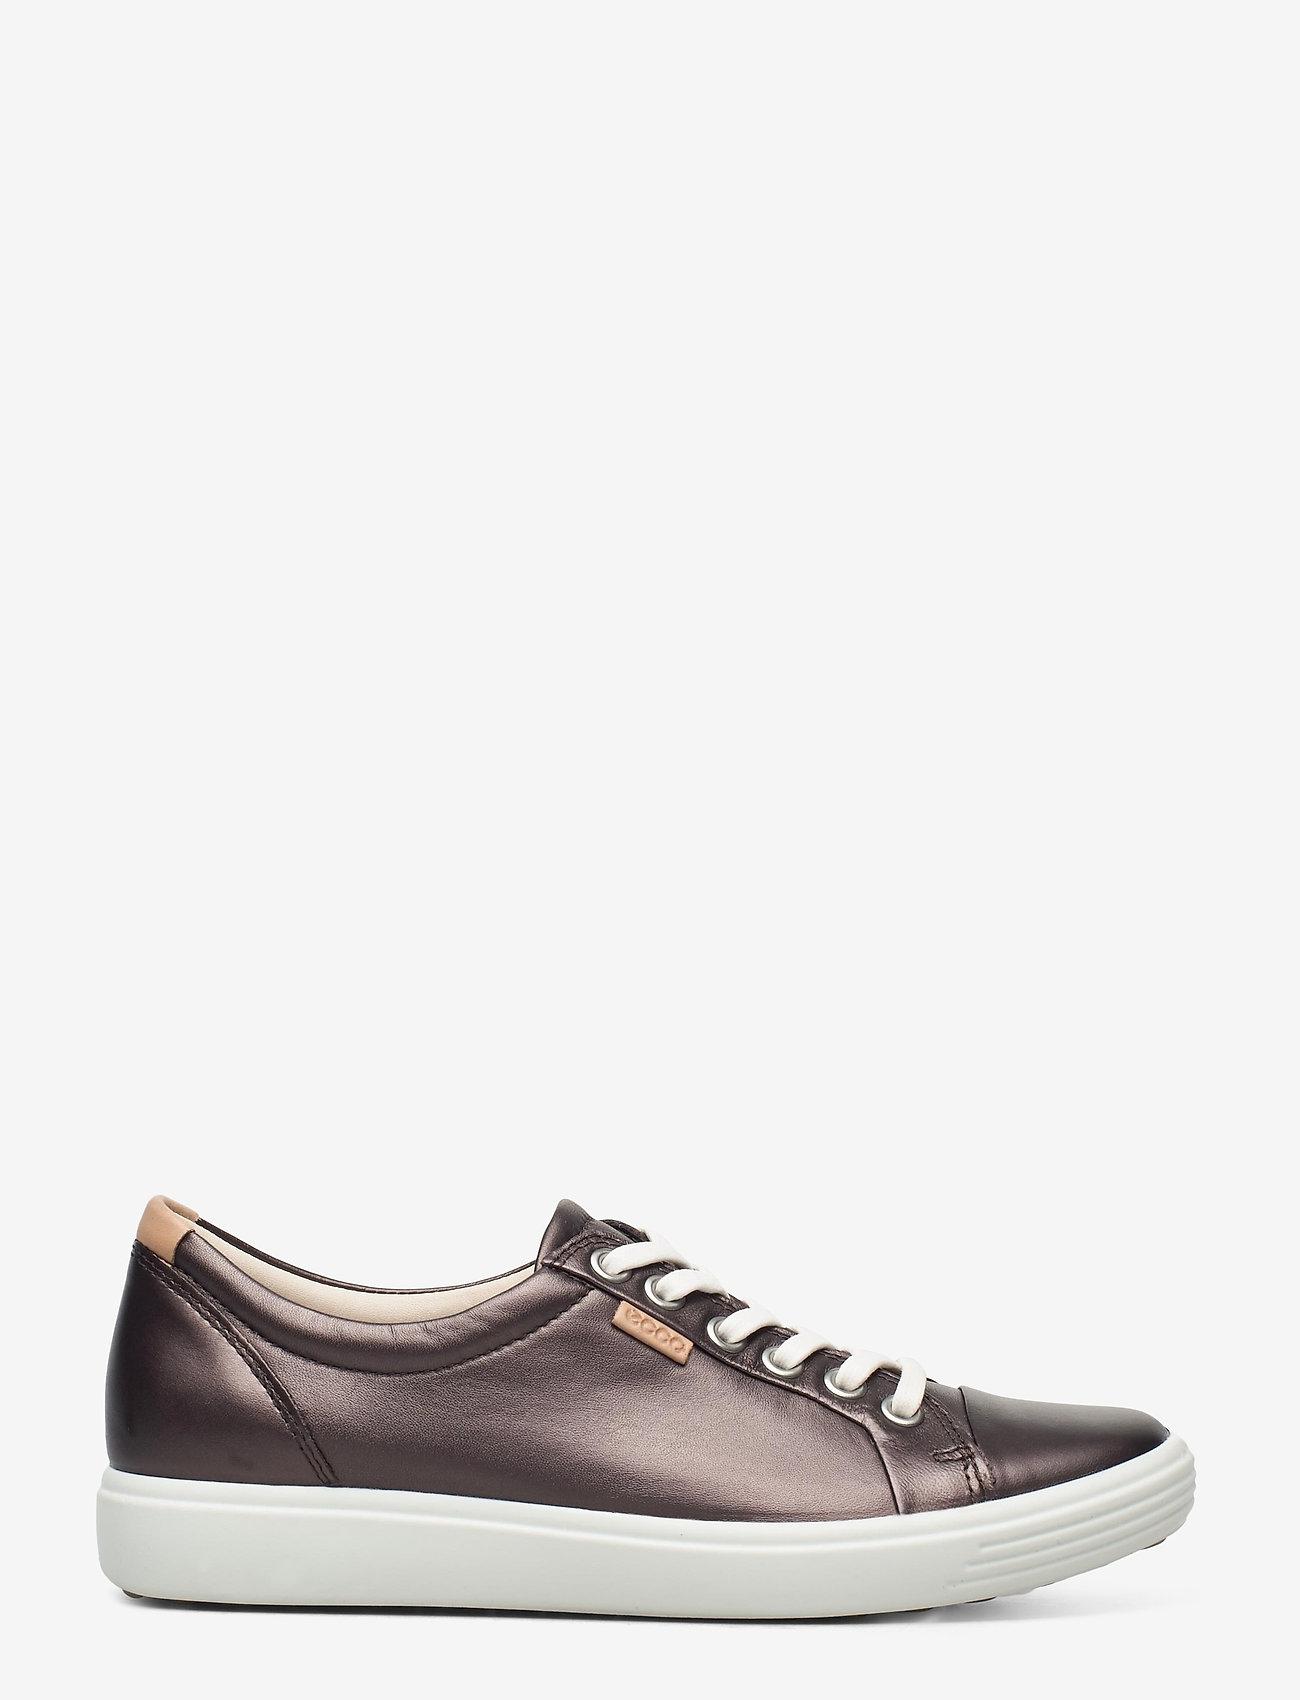 ECCO - SOFT 7 W - låga sneakers - shale metallic - 1